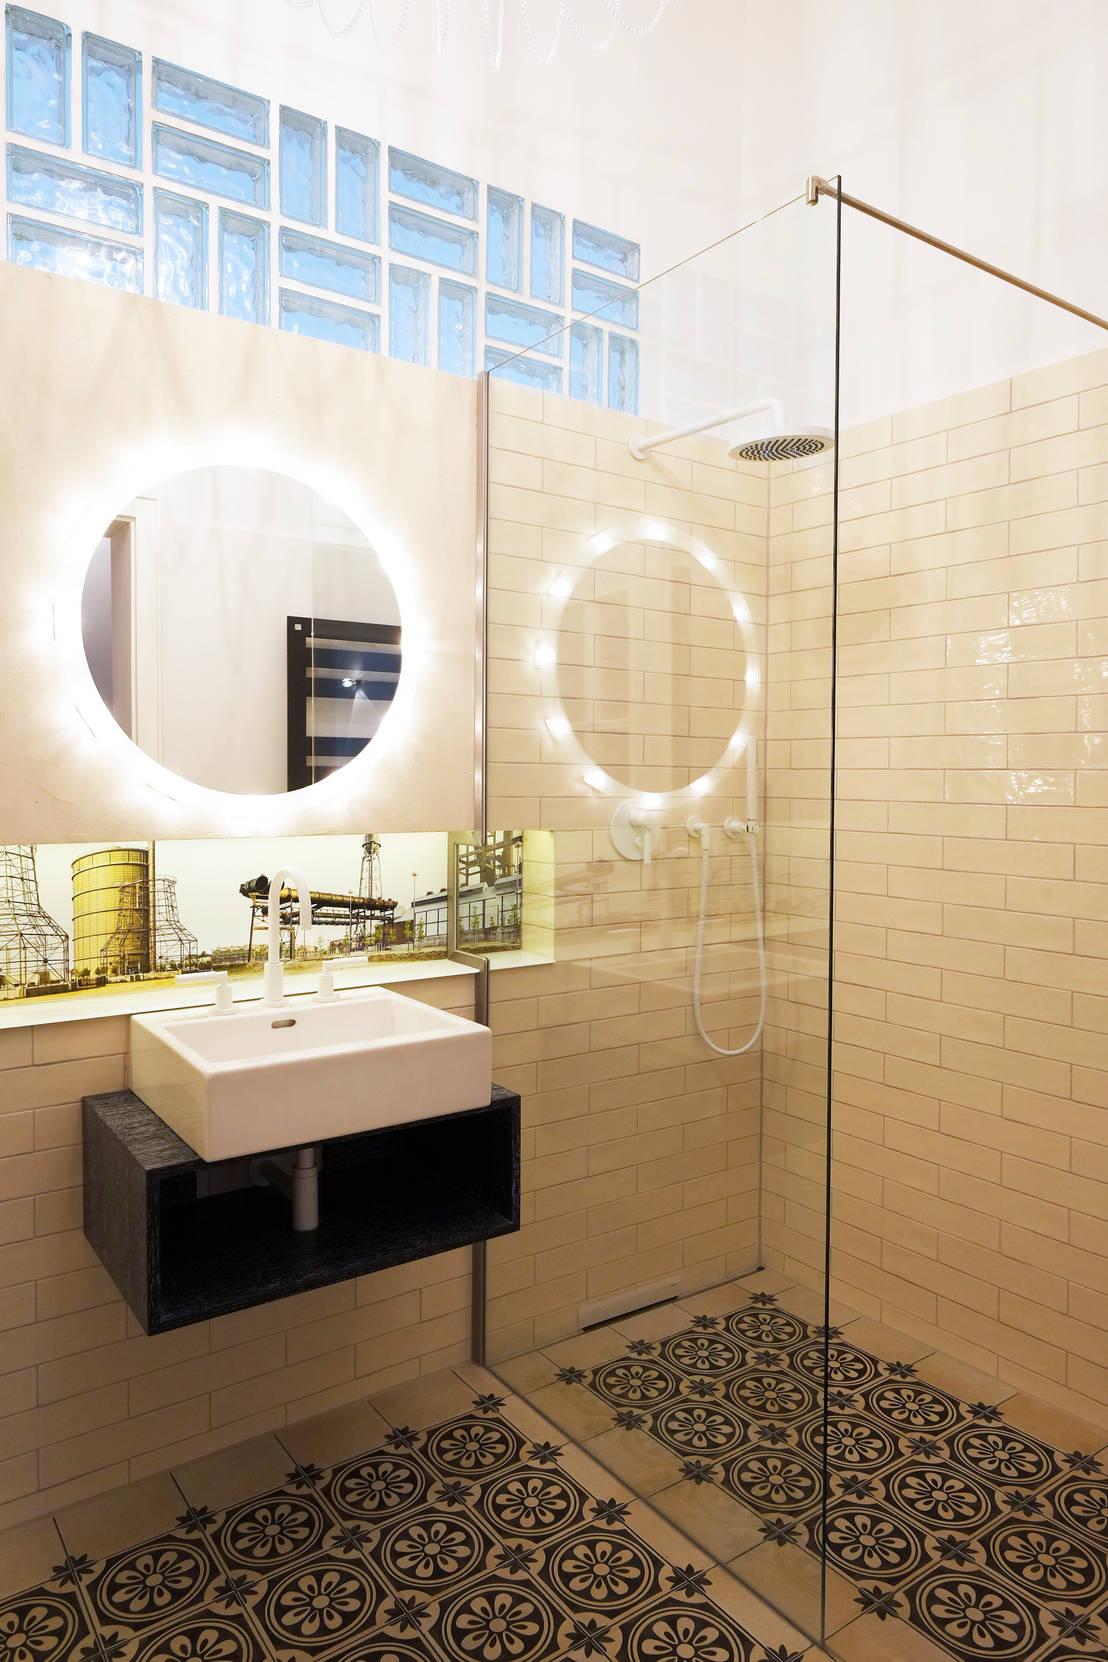 bad altbau dortmund de raumgesp r innenarchitektur design. Black Bedroom Furniture Sets. Home Design Ideas